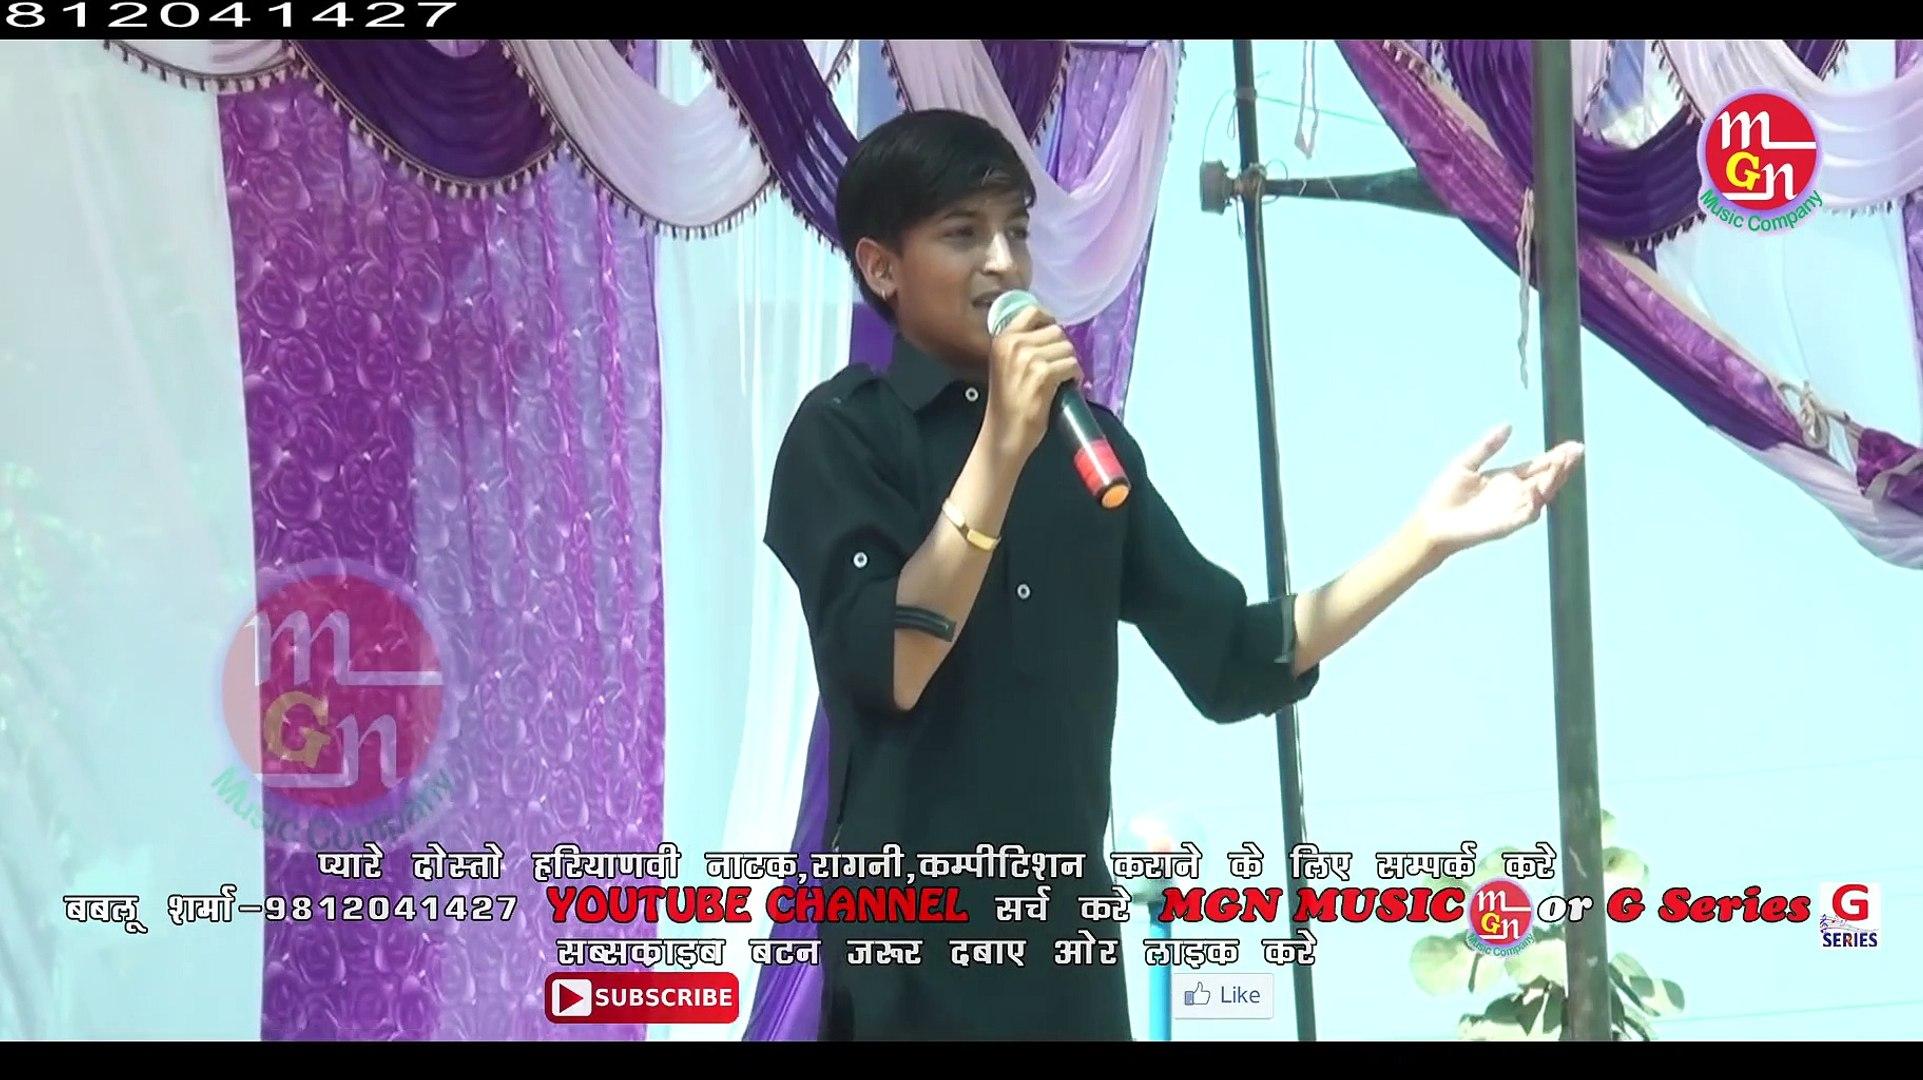 हरी मिर्च की रोमेंटिक चुटकुले || Hari Mirch Haryanvi Hit Comedy 2020|| MGN Music ¦¦ Hari Mirch Harya